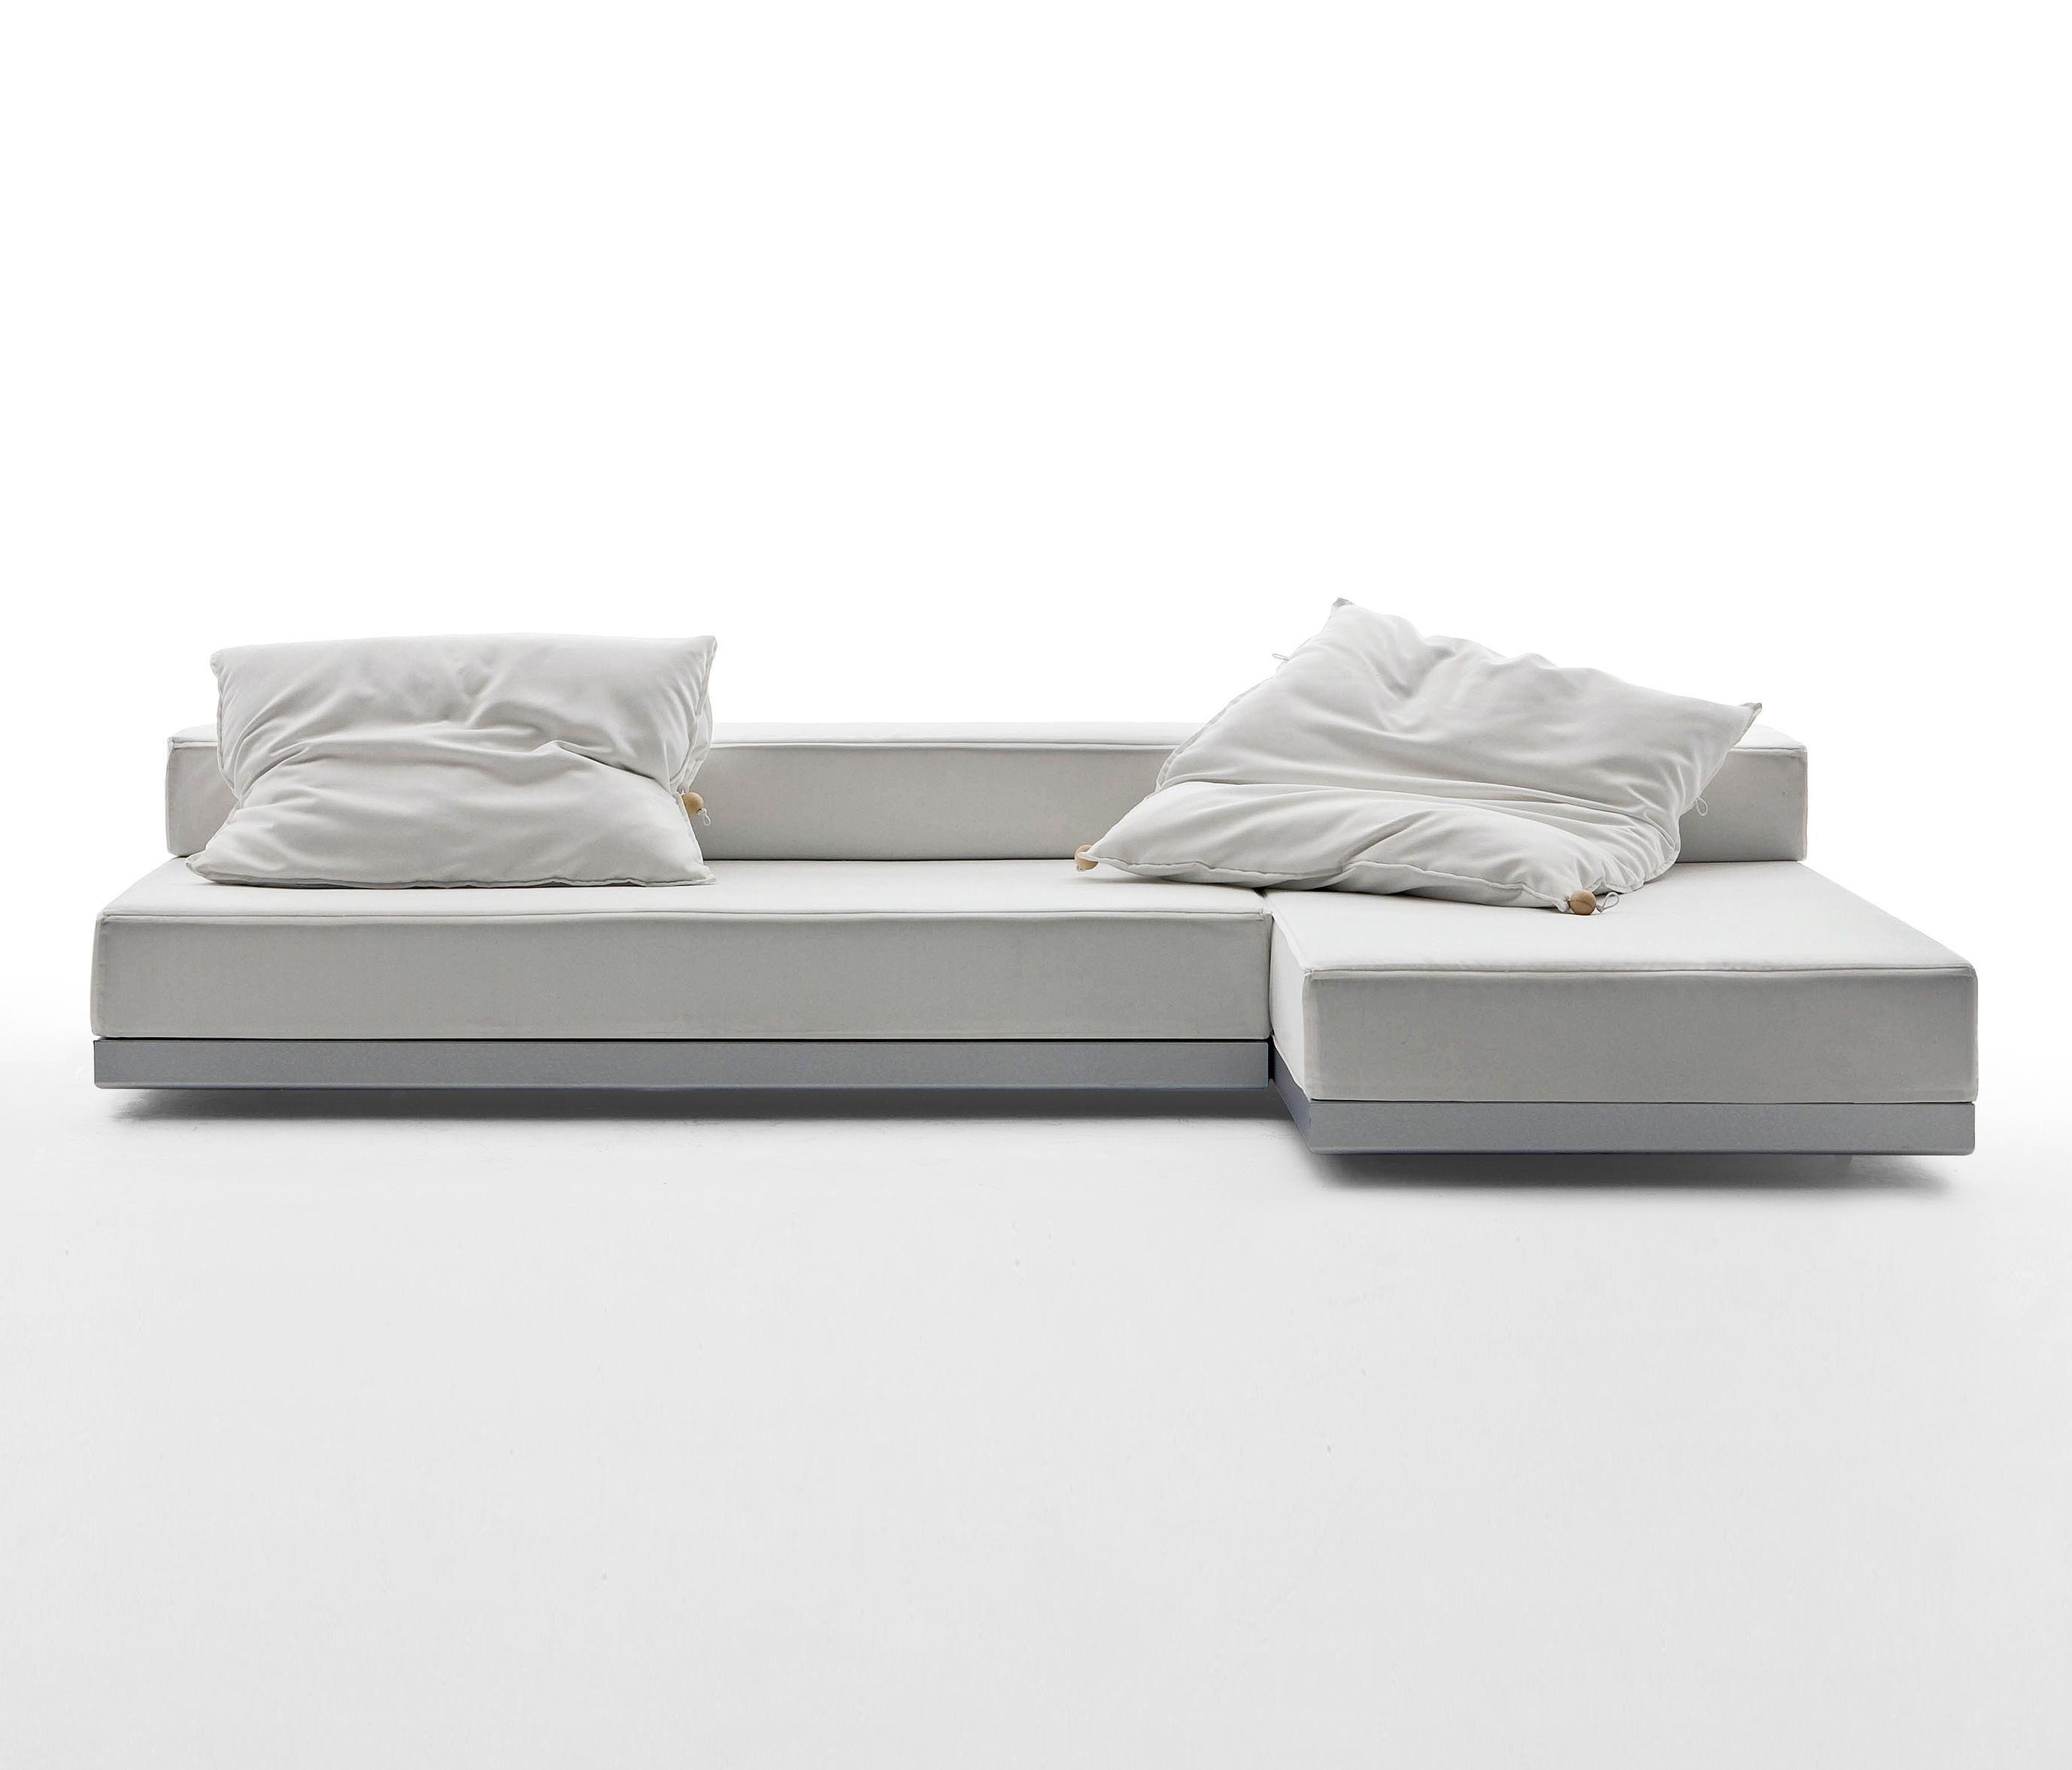 Bed Breakfast Sofa Bed Sofas From Saba Italia Architonic Sofa Bed And Breakfast Sofa Bed